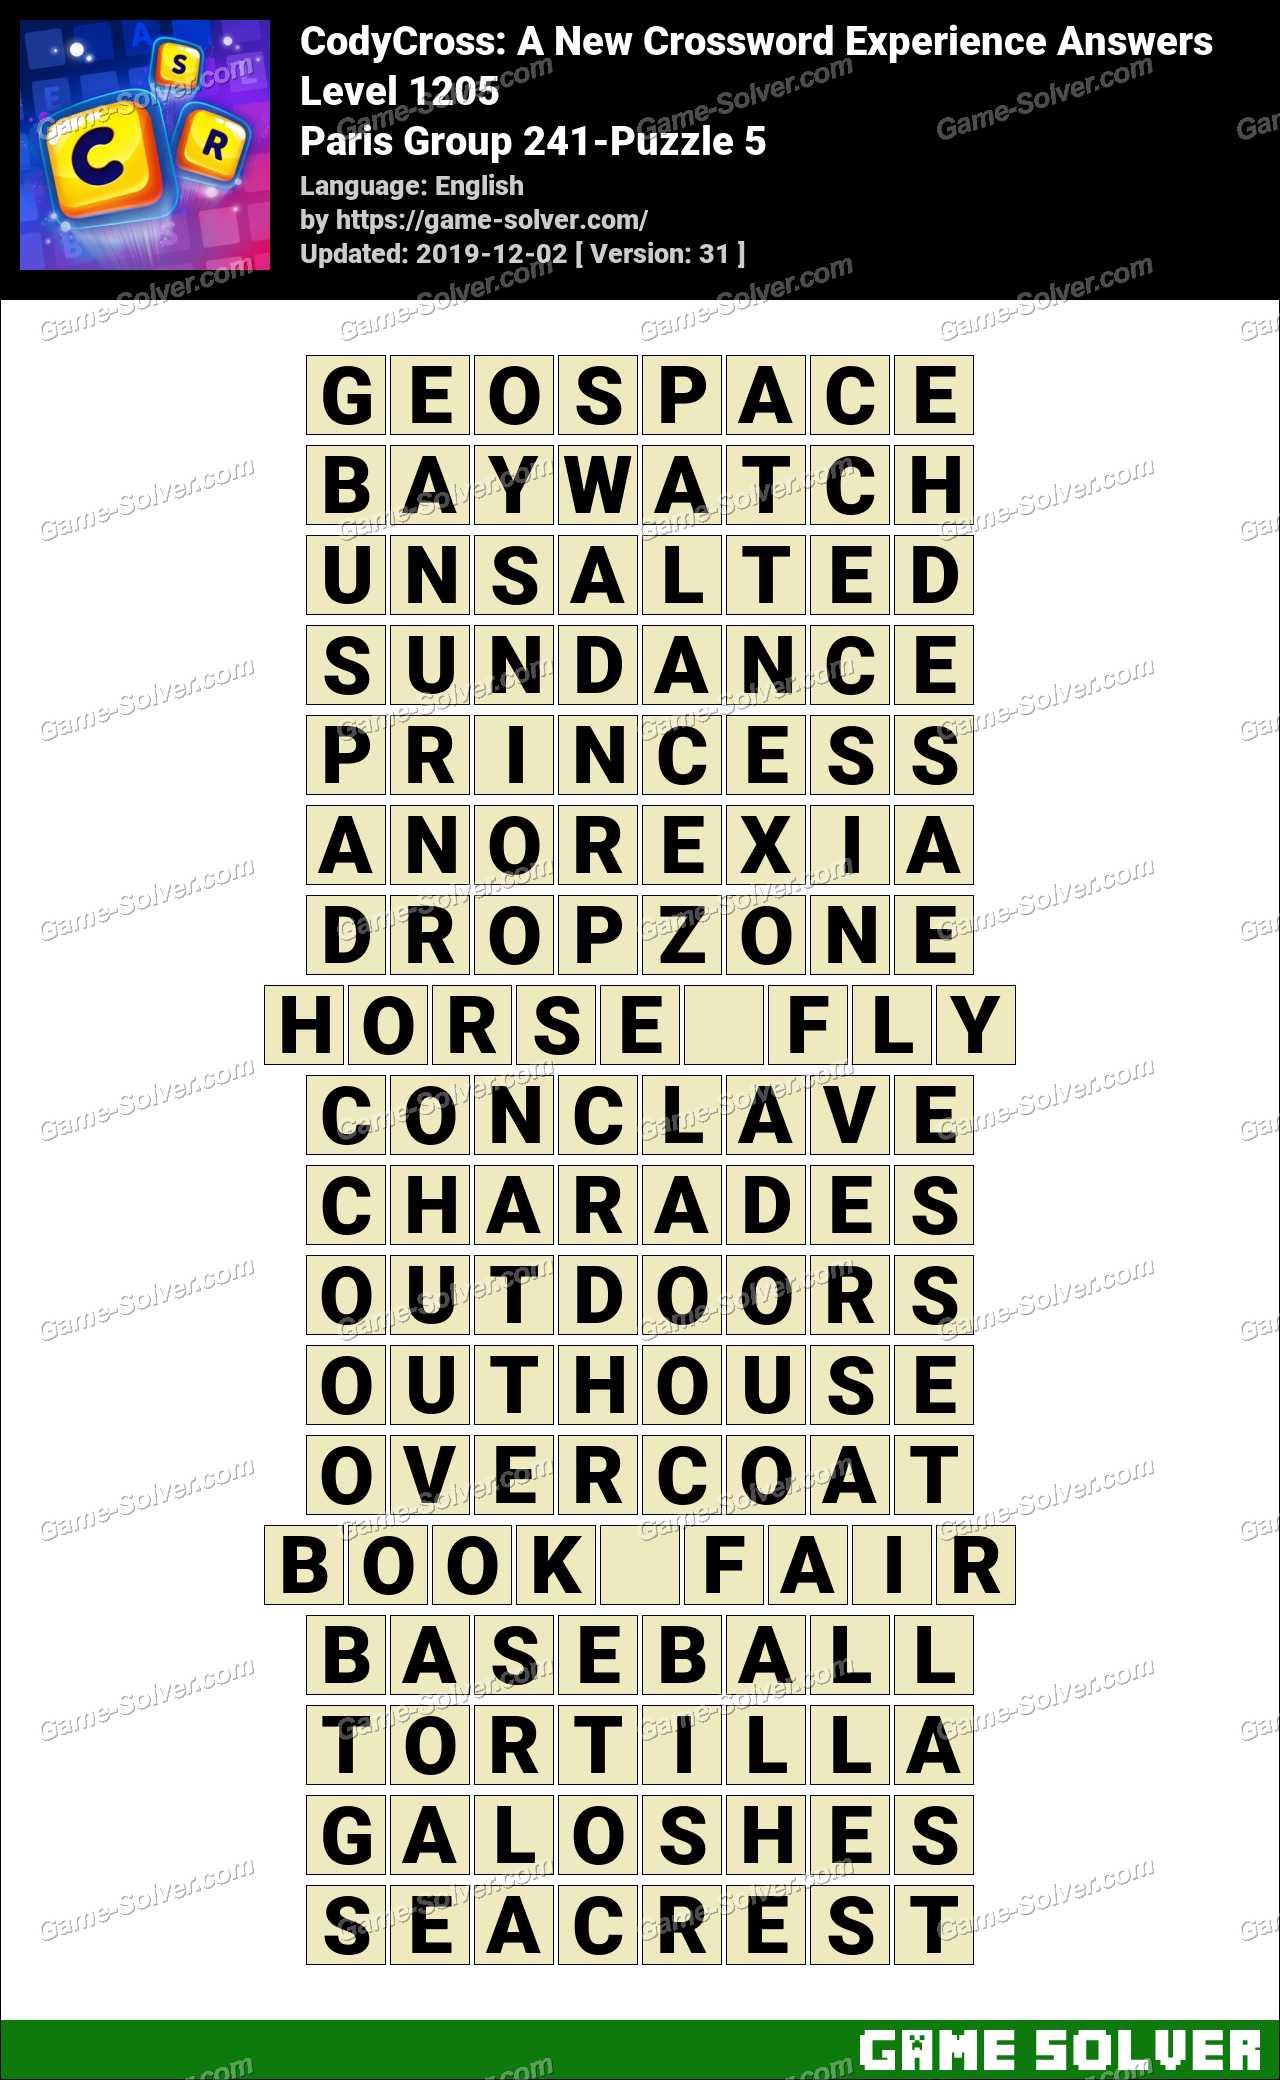 CodyCross Paris Group 241-Puzzle 5 Answers